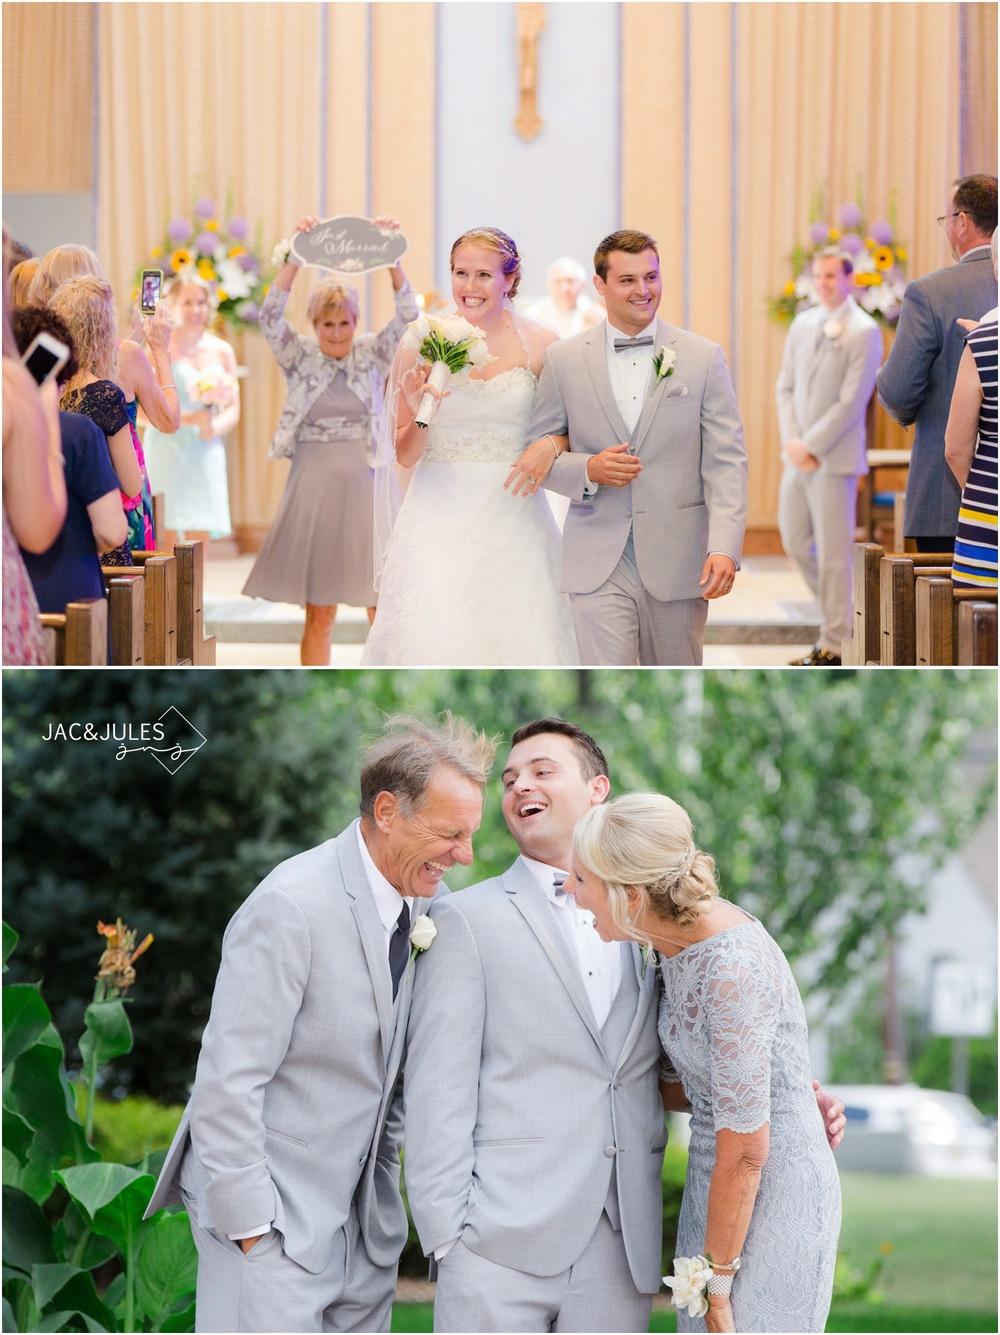 wedding ceremony exit, funny family photo.